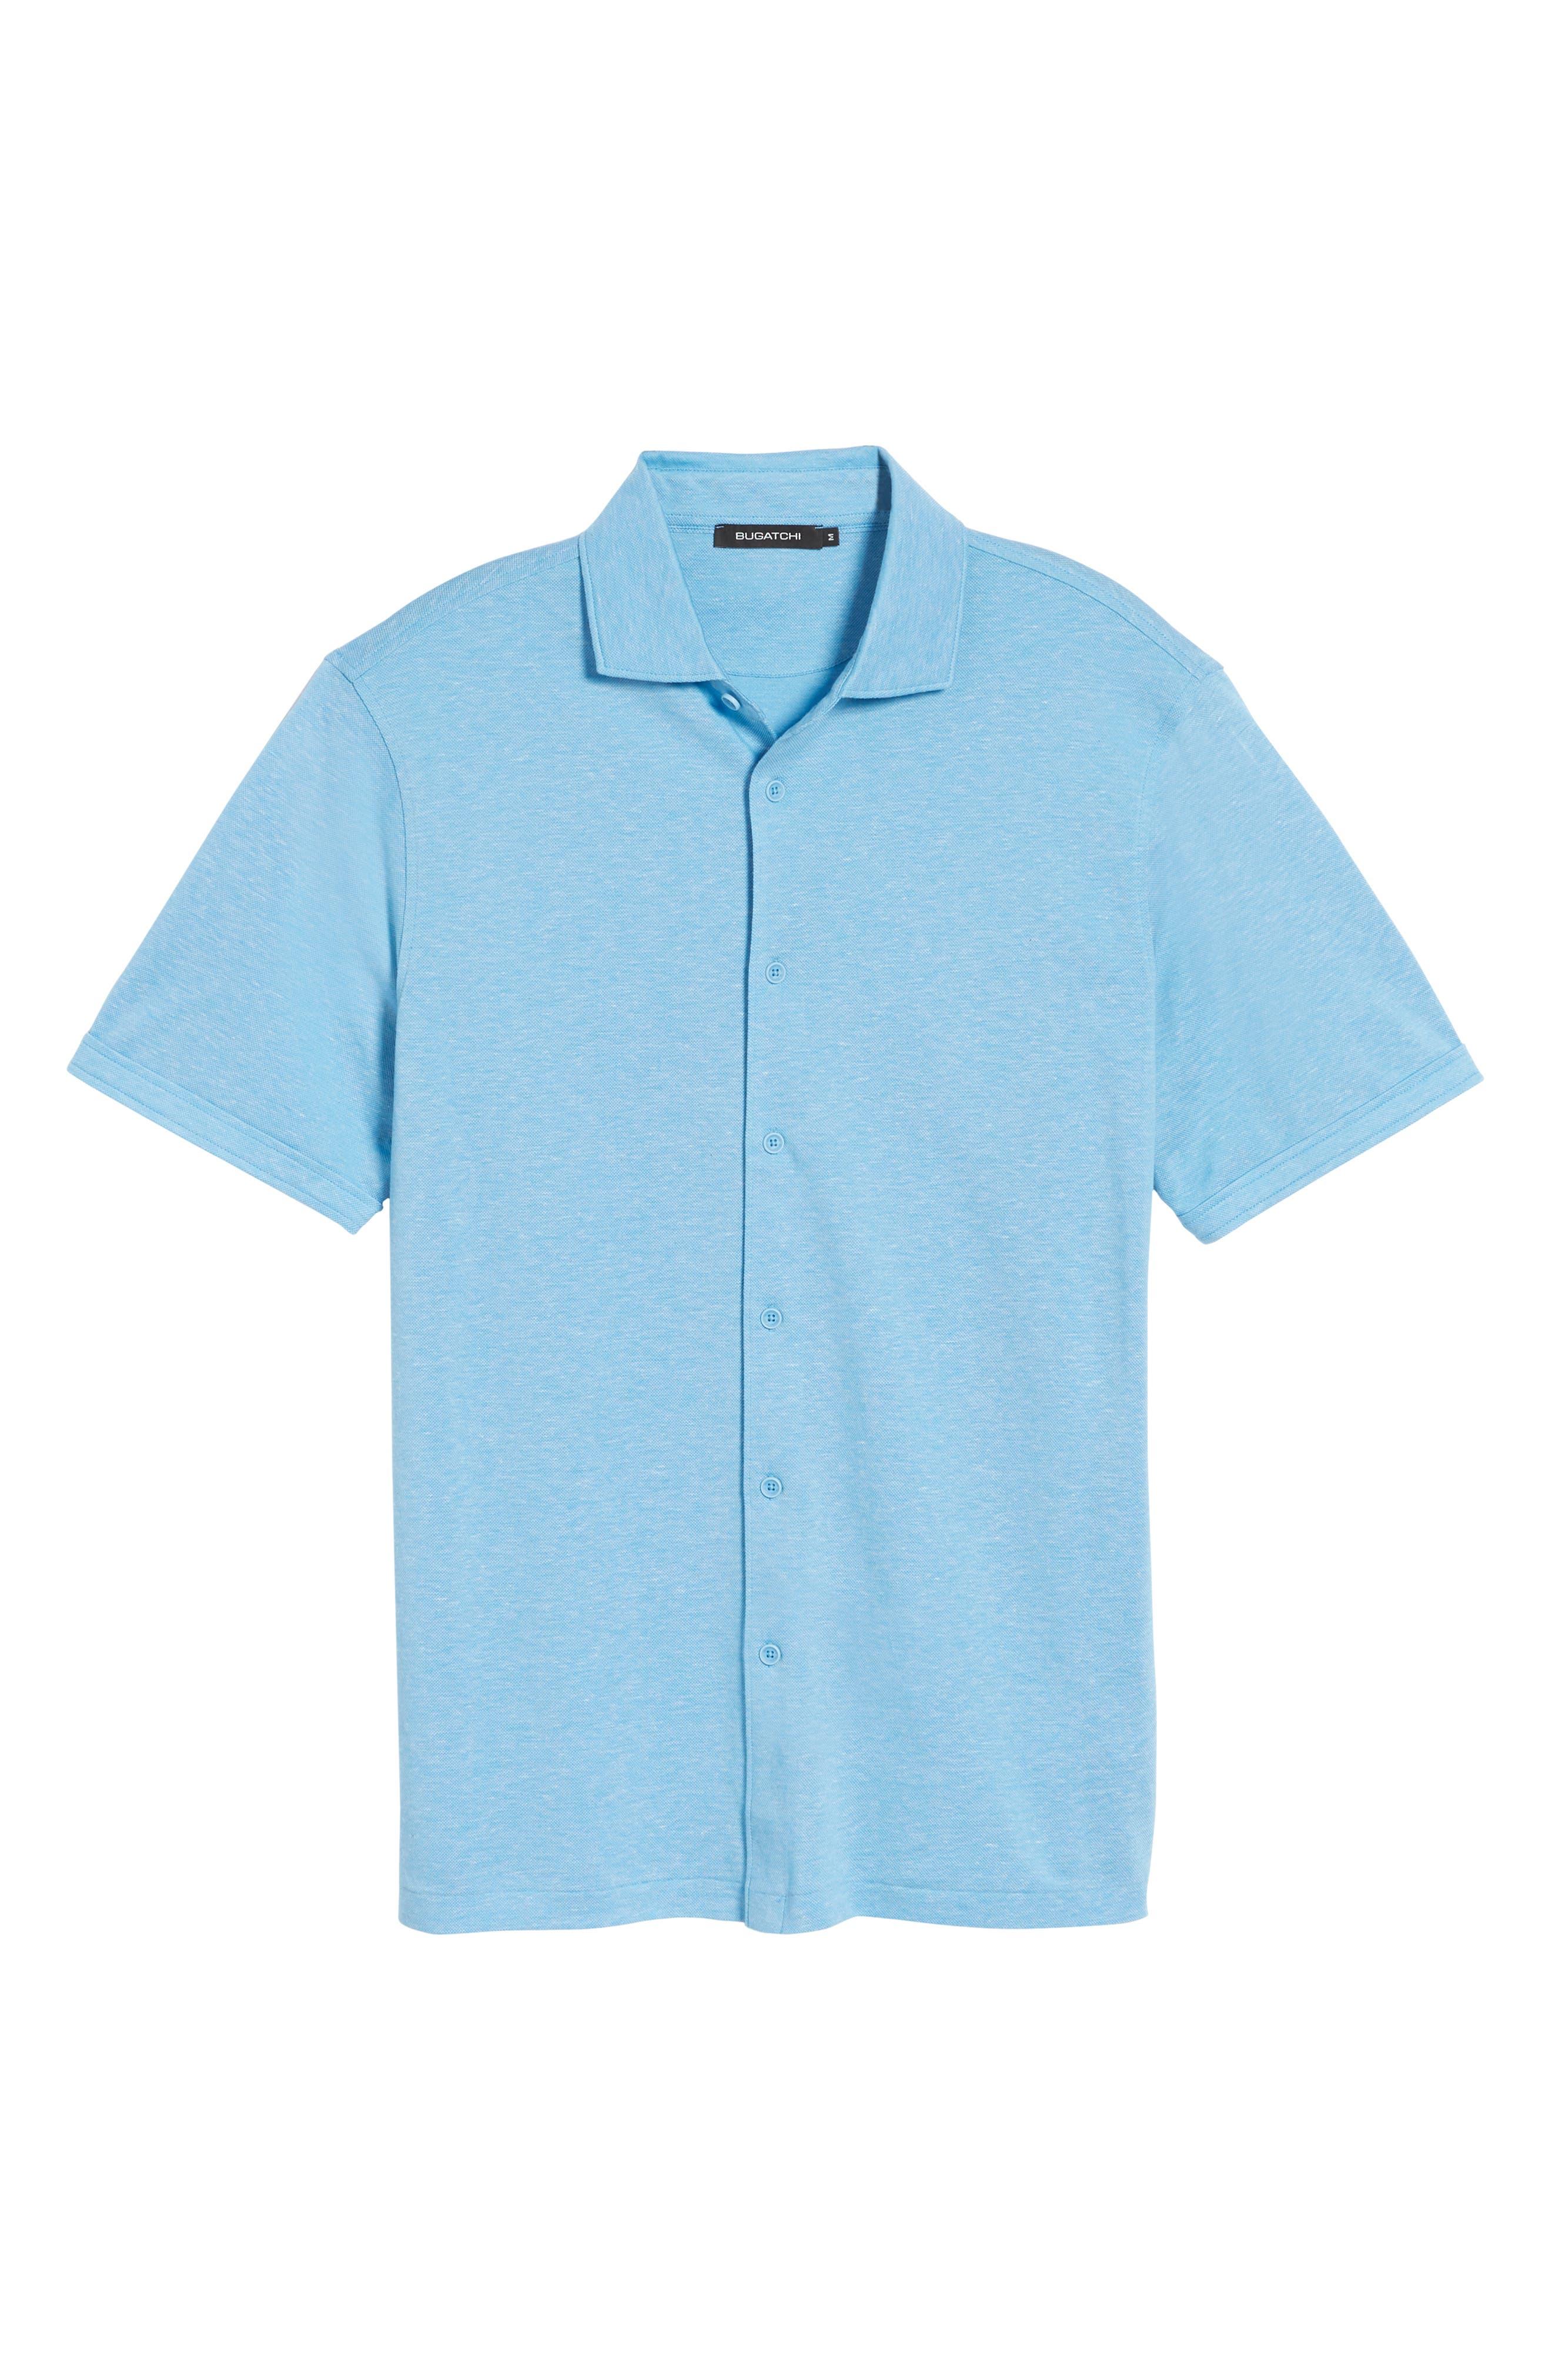 Regular Fit Heather Knit Sport Shirt,                             Alternate thumbnail 6, color,                             Air Blue